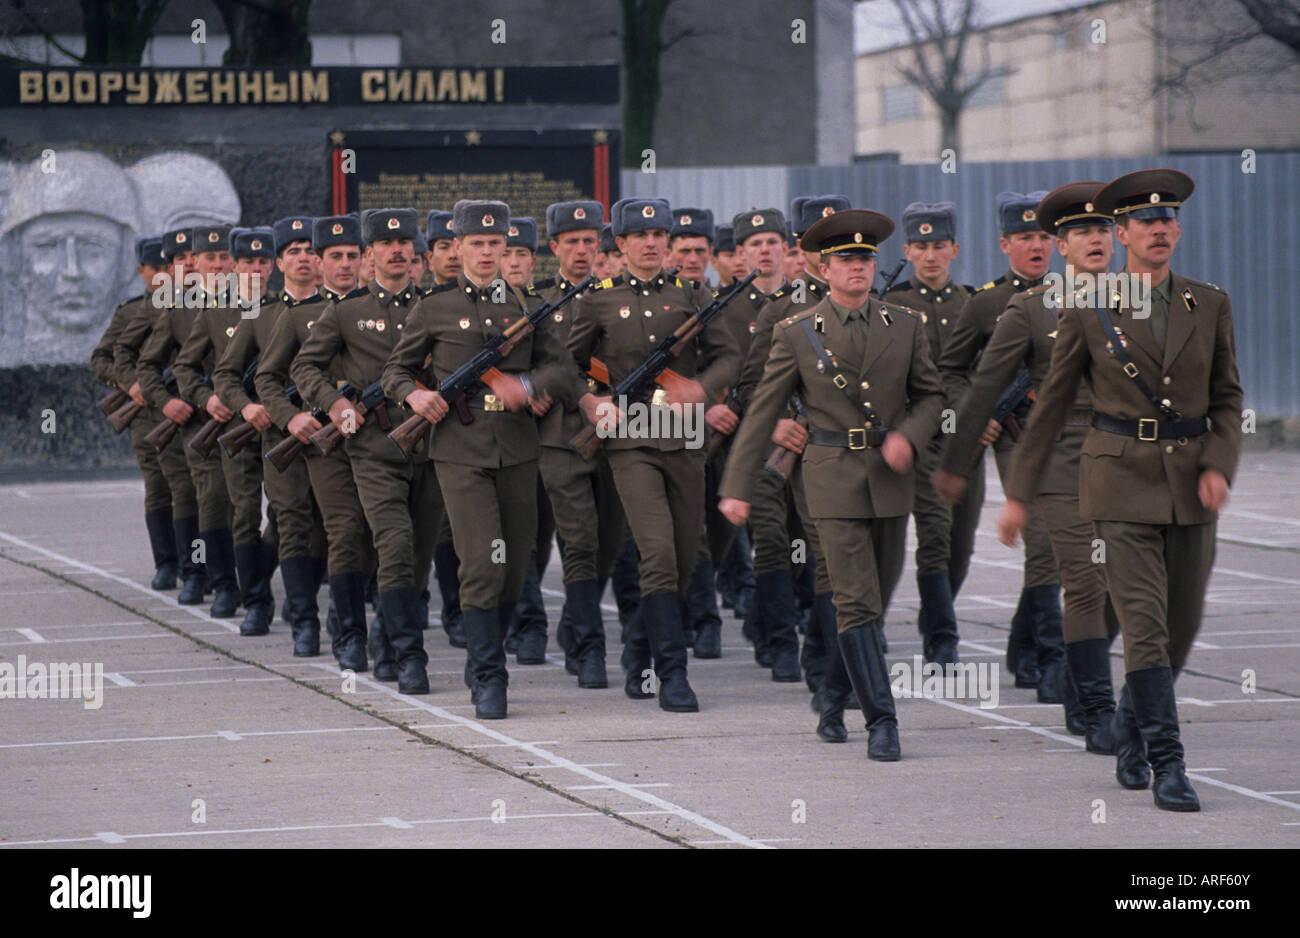 russian soldiers march barracks frankfurt oder eastern germany stock photo 16036394 alamy. Black Bedroom Furniture Sets. Home Design Ideas